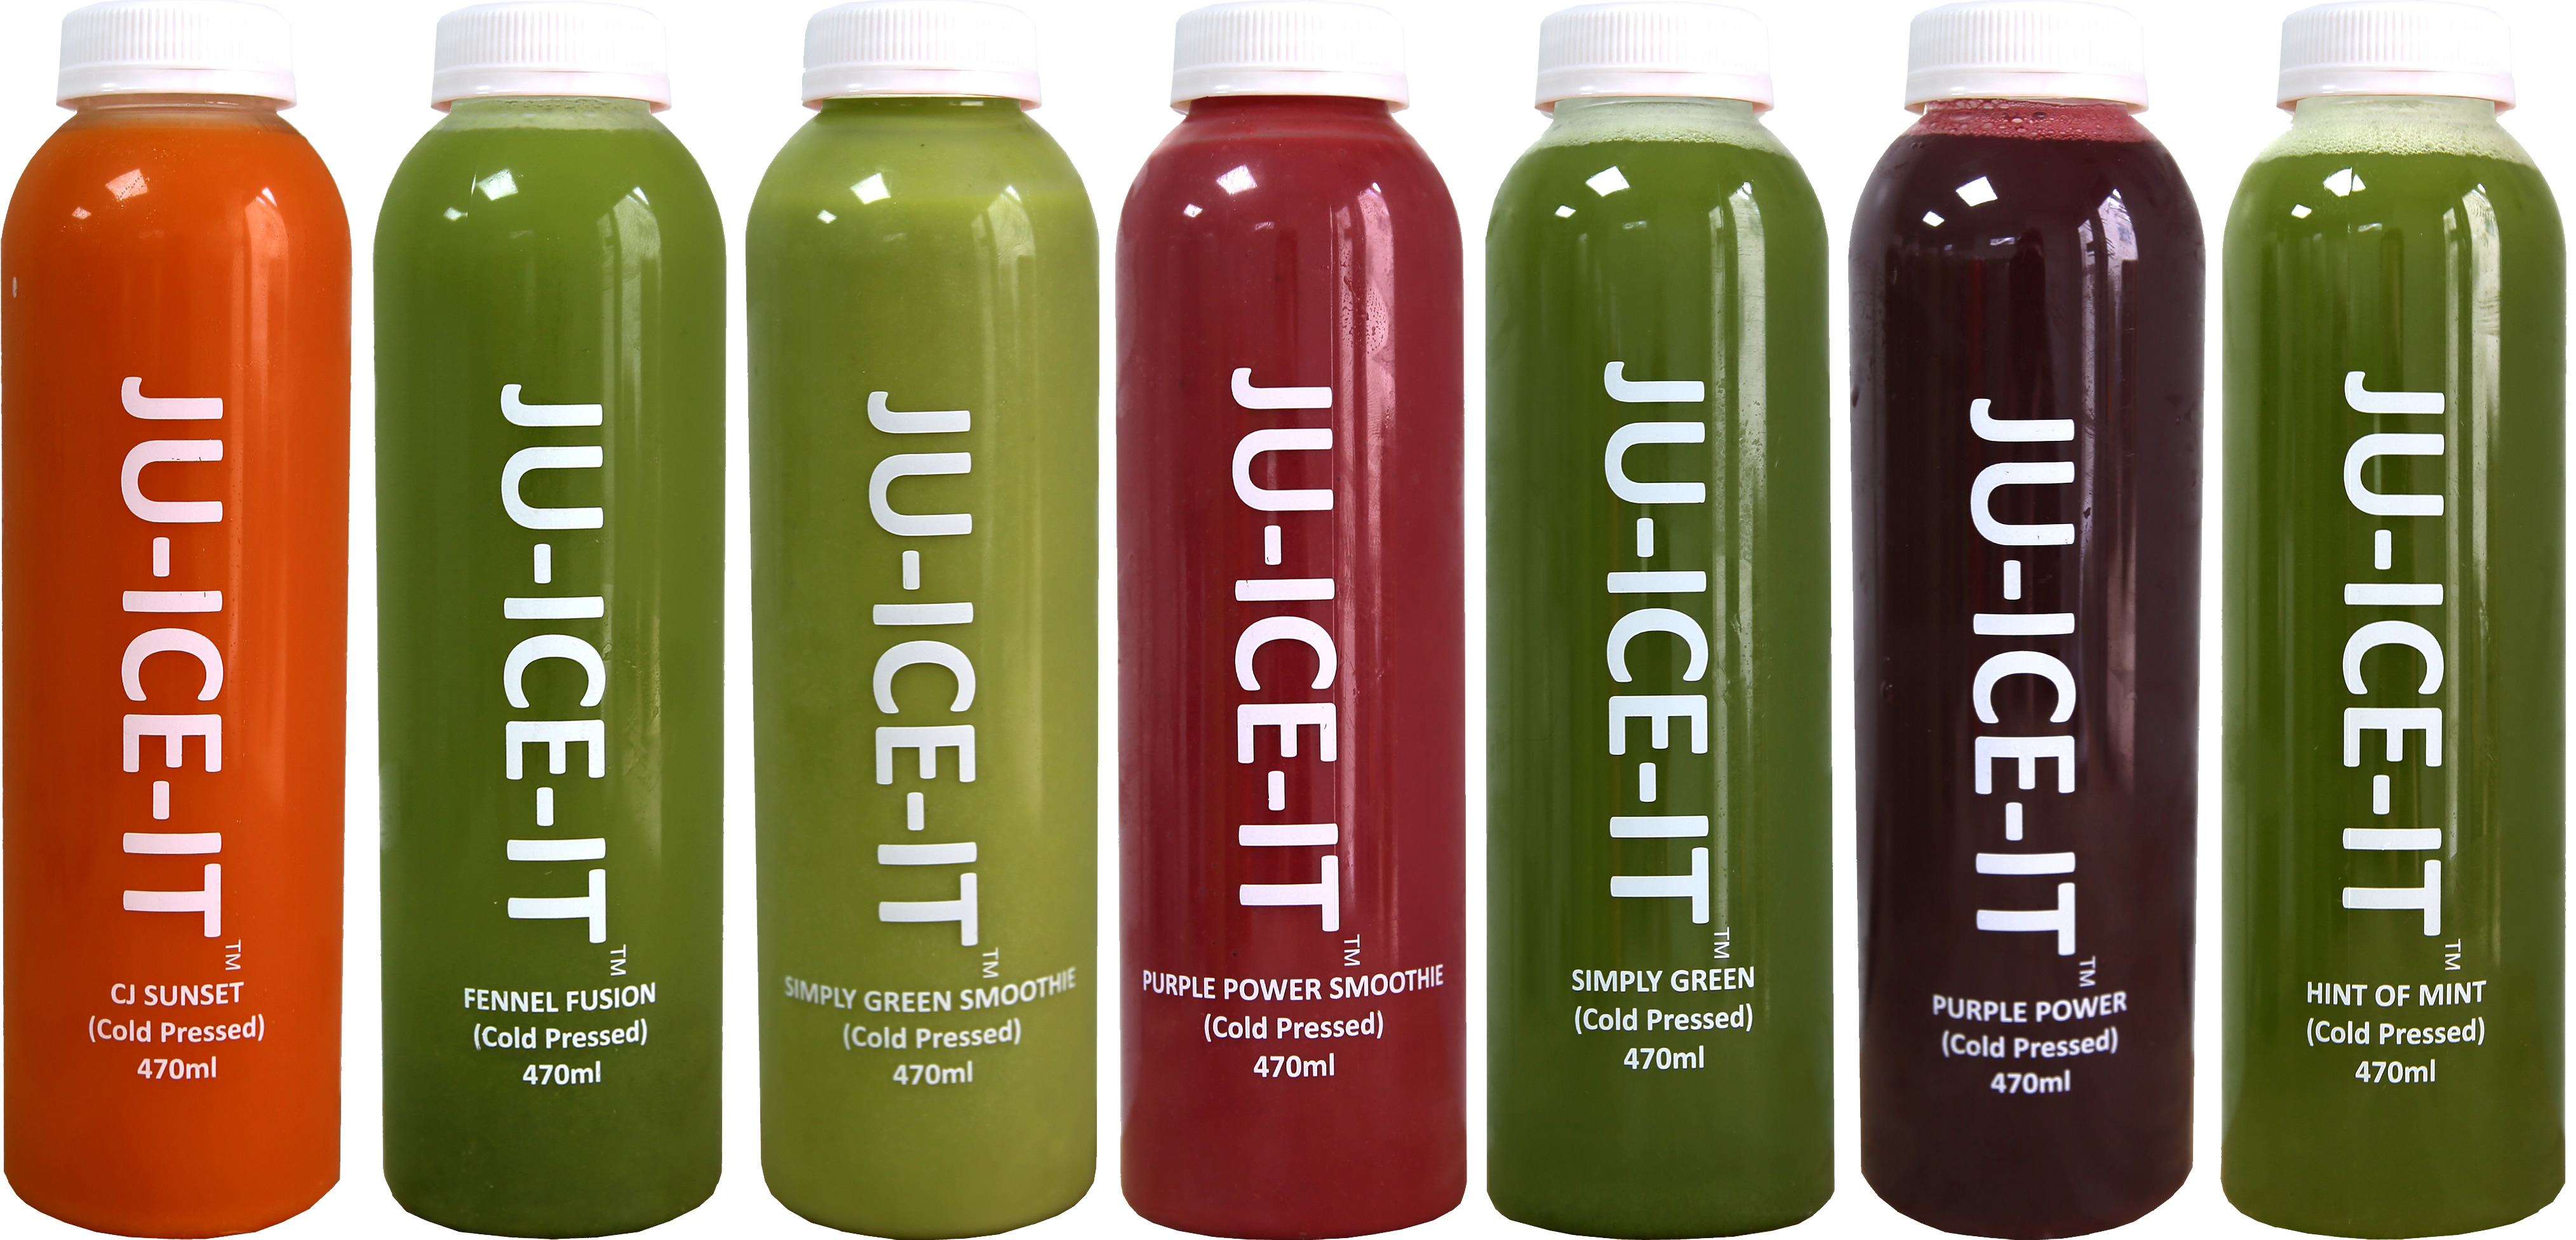 7 juices